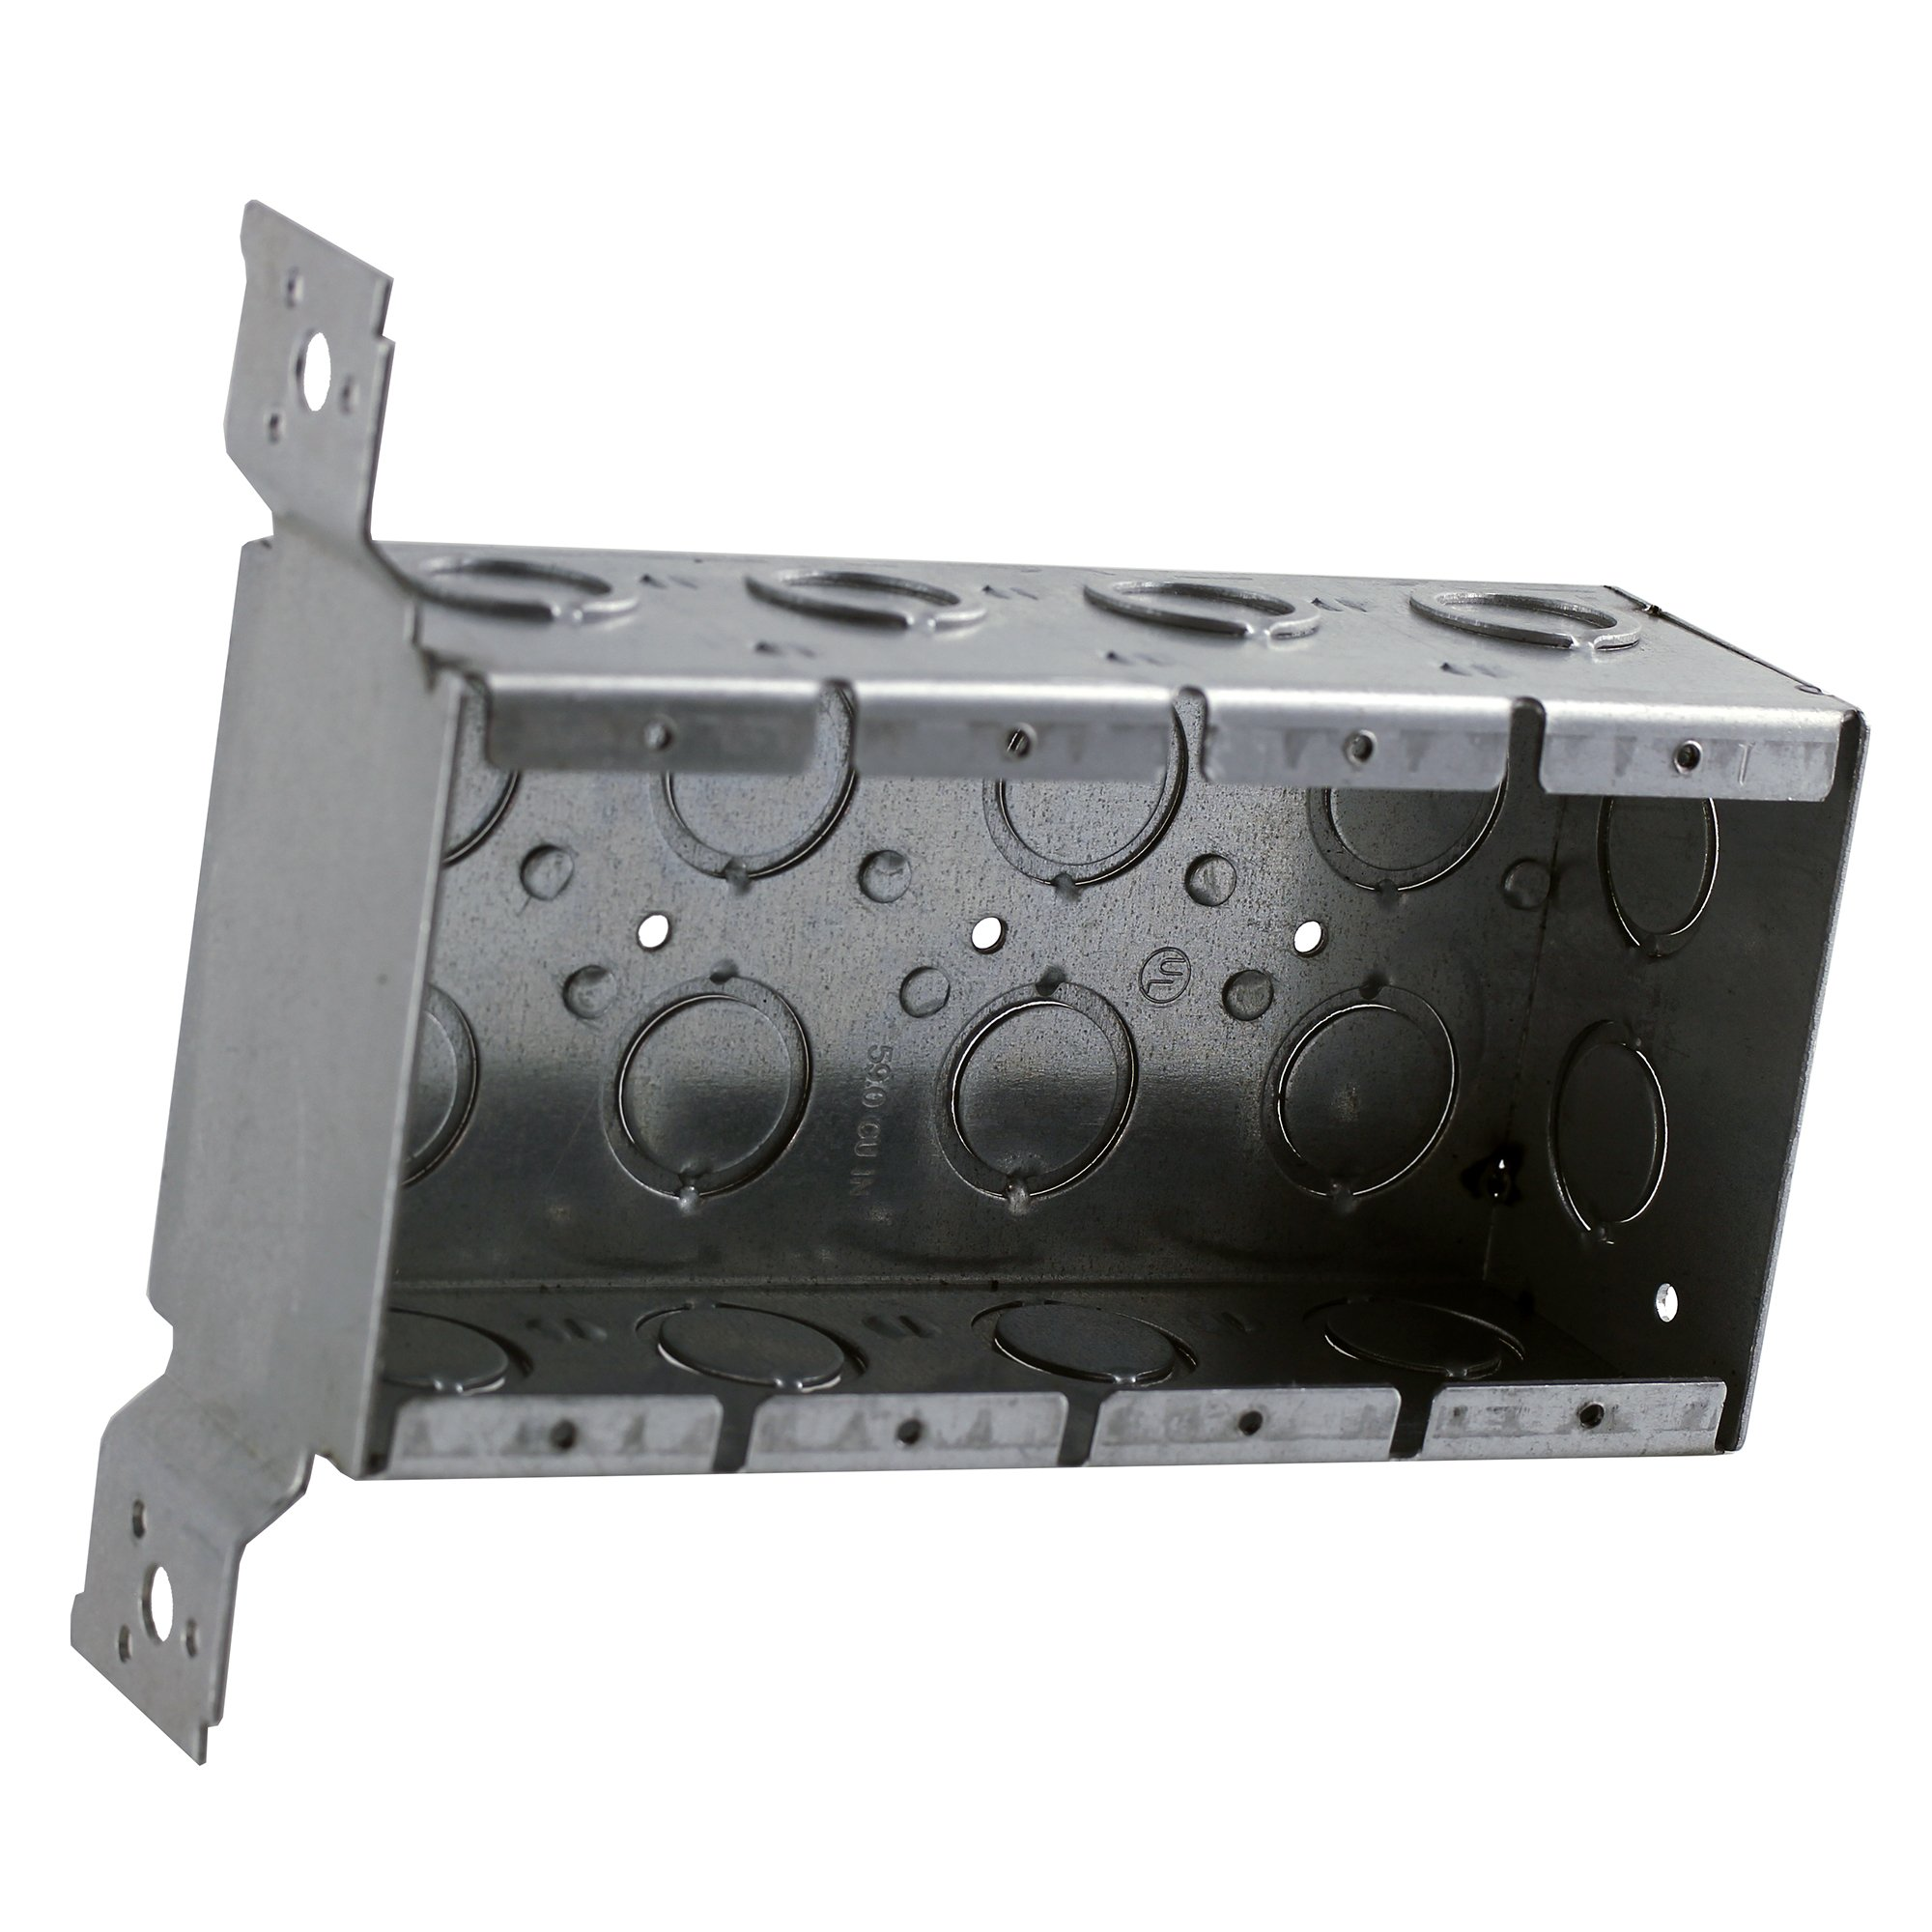 4 Gang 2 1/2'' Deep Switch Box w/FM brackets